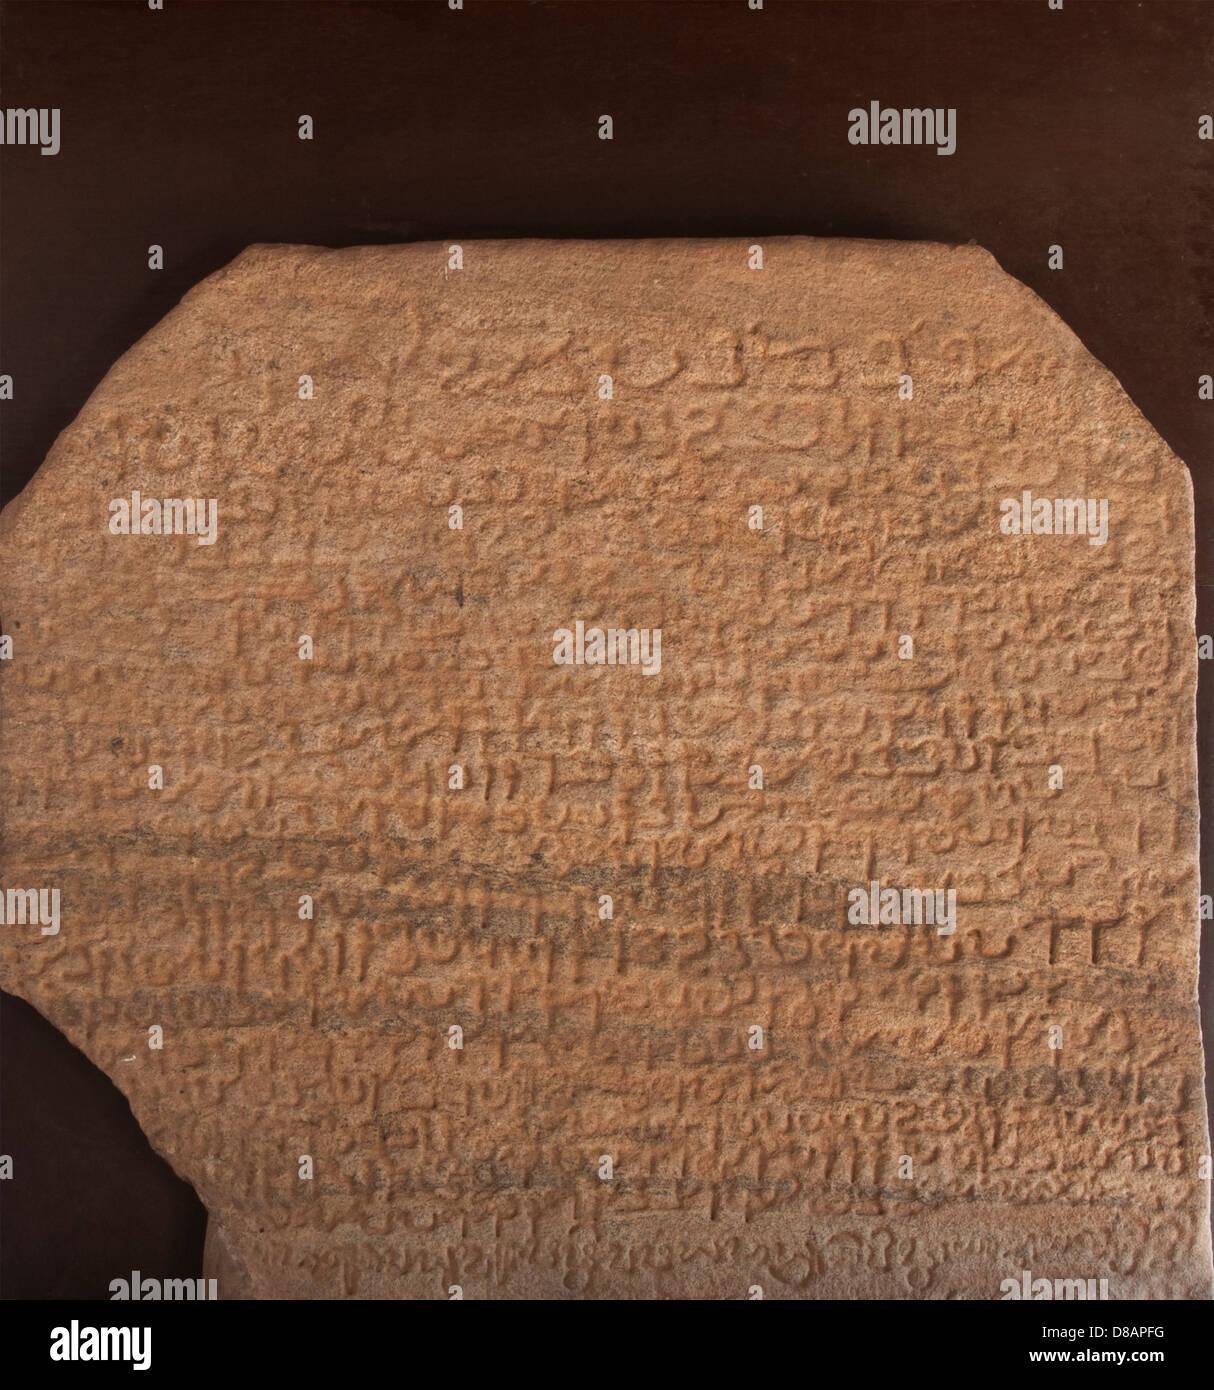 stone inscriptions, India - Stock Image